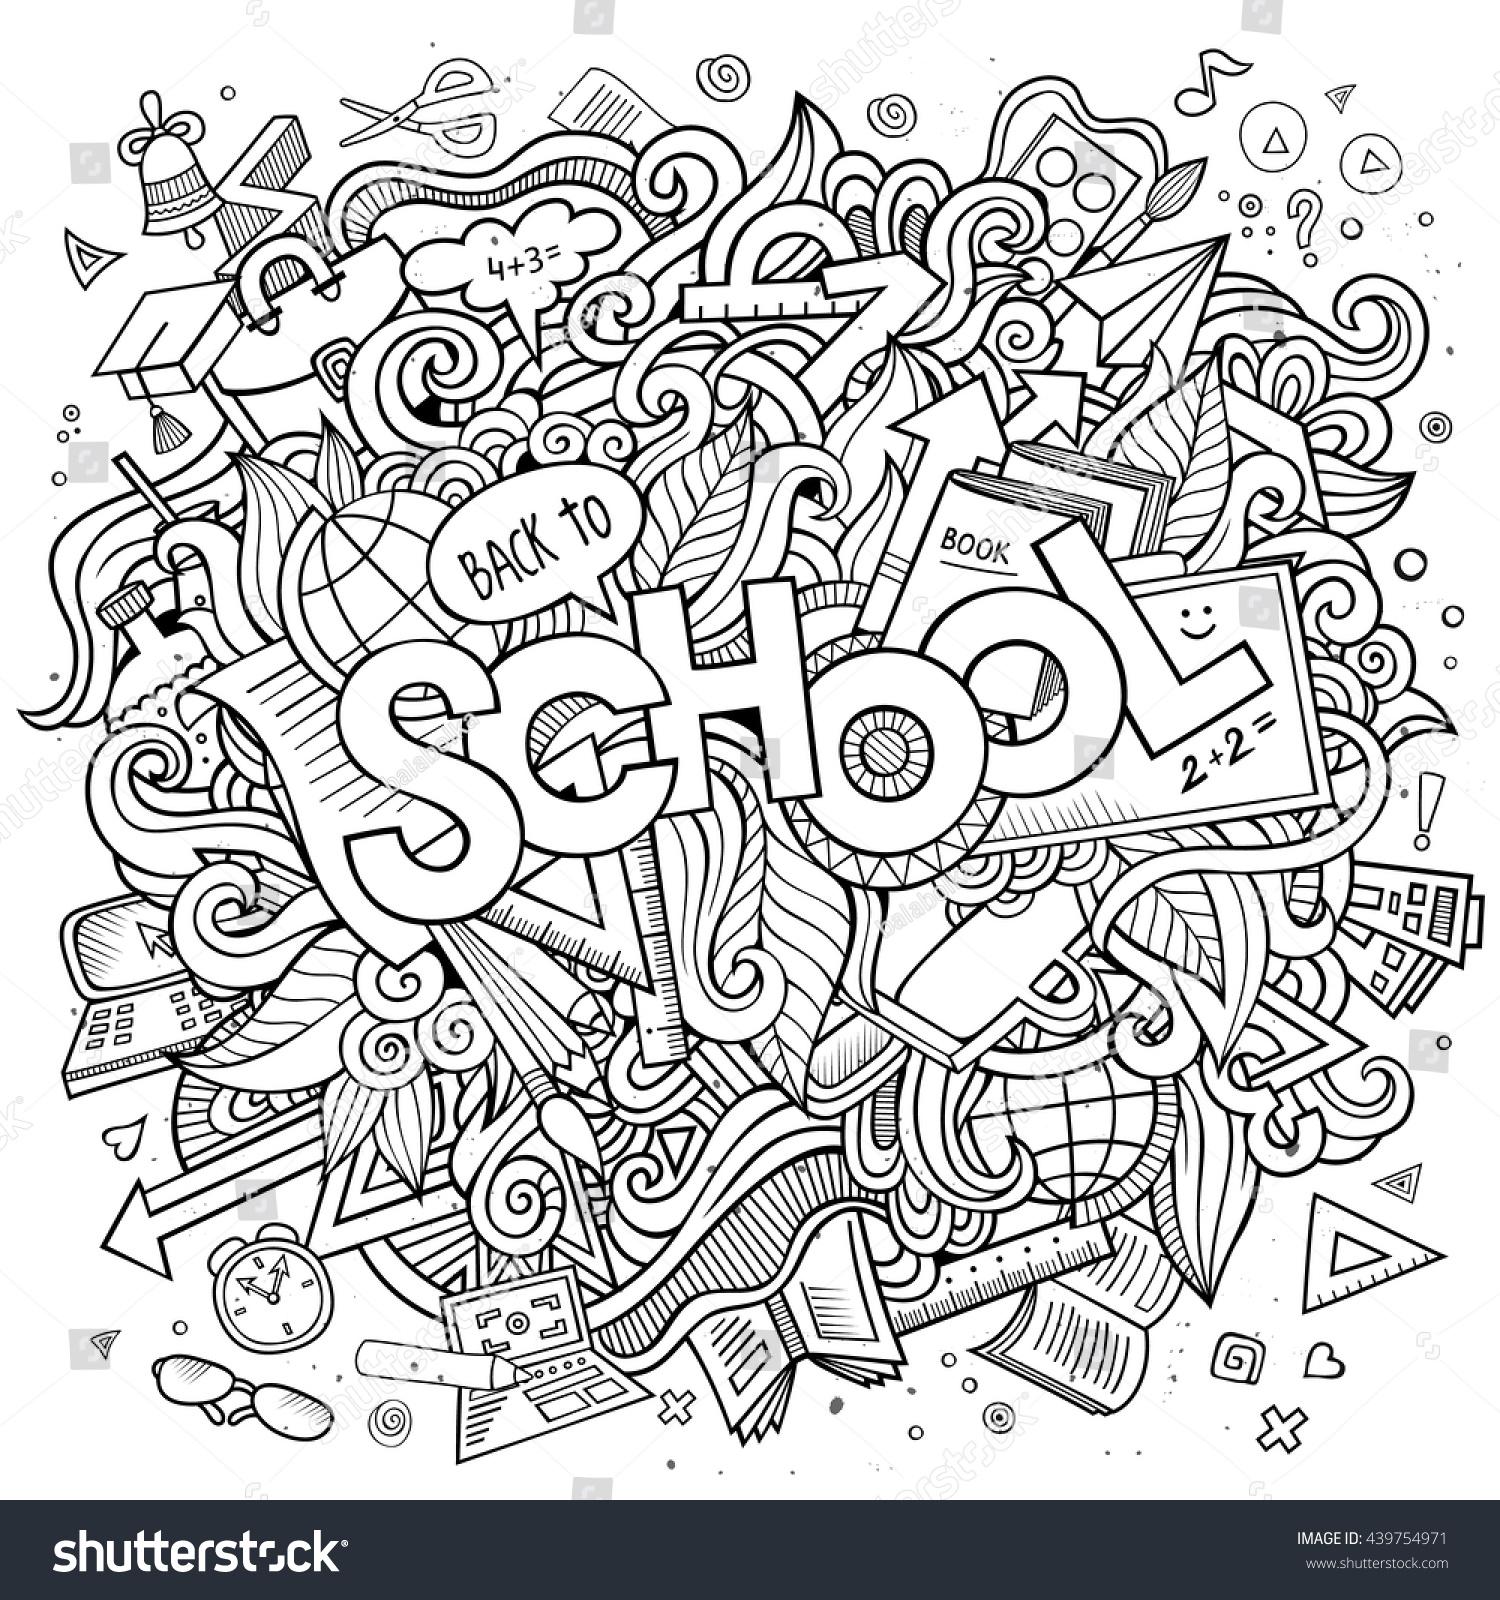 Line Art Doodles : Cartoon cute doodles hand drawn school stock vector